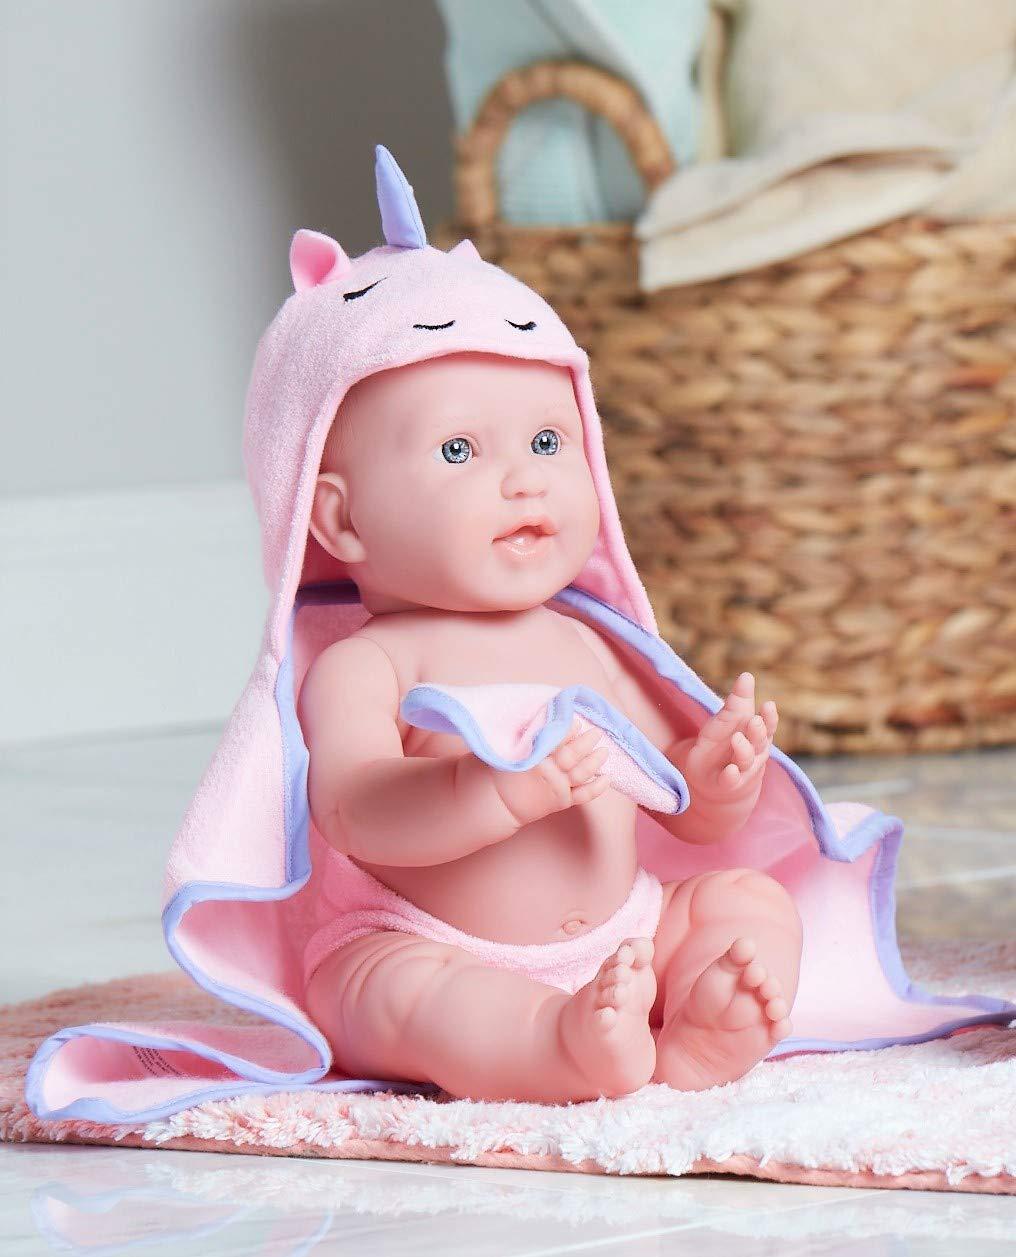 b0a045ad0 Amazon.com  JC Toys Bubbles   Bath Girl Baby Doll